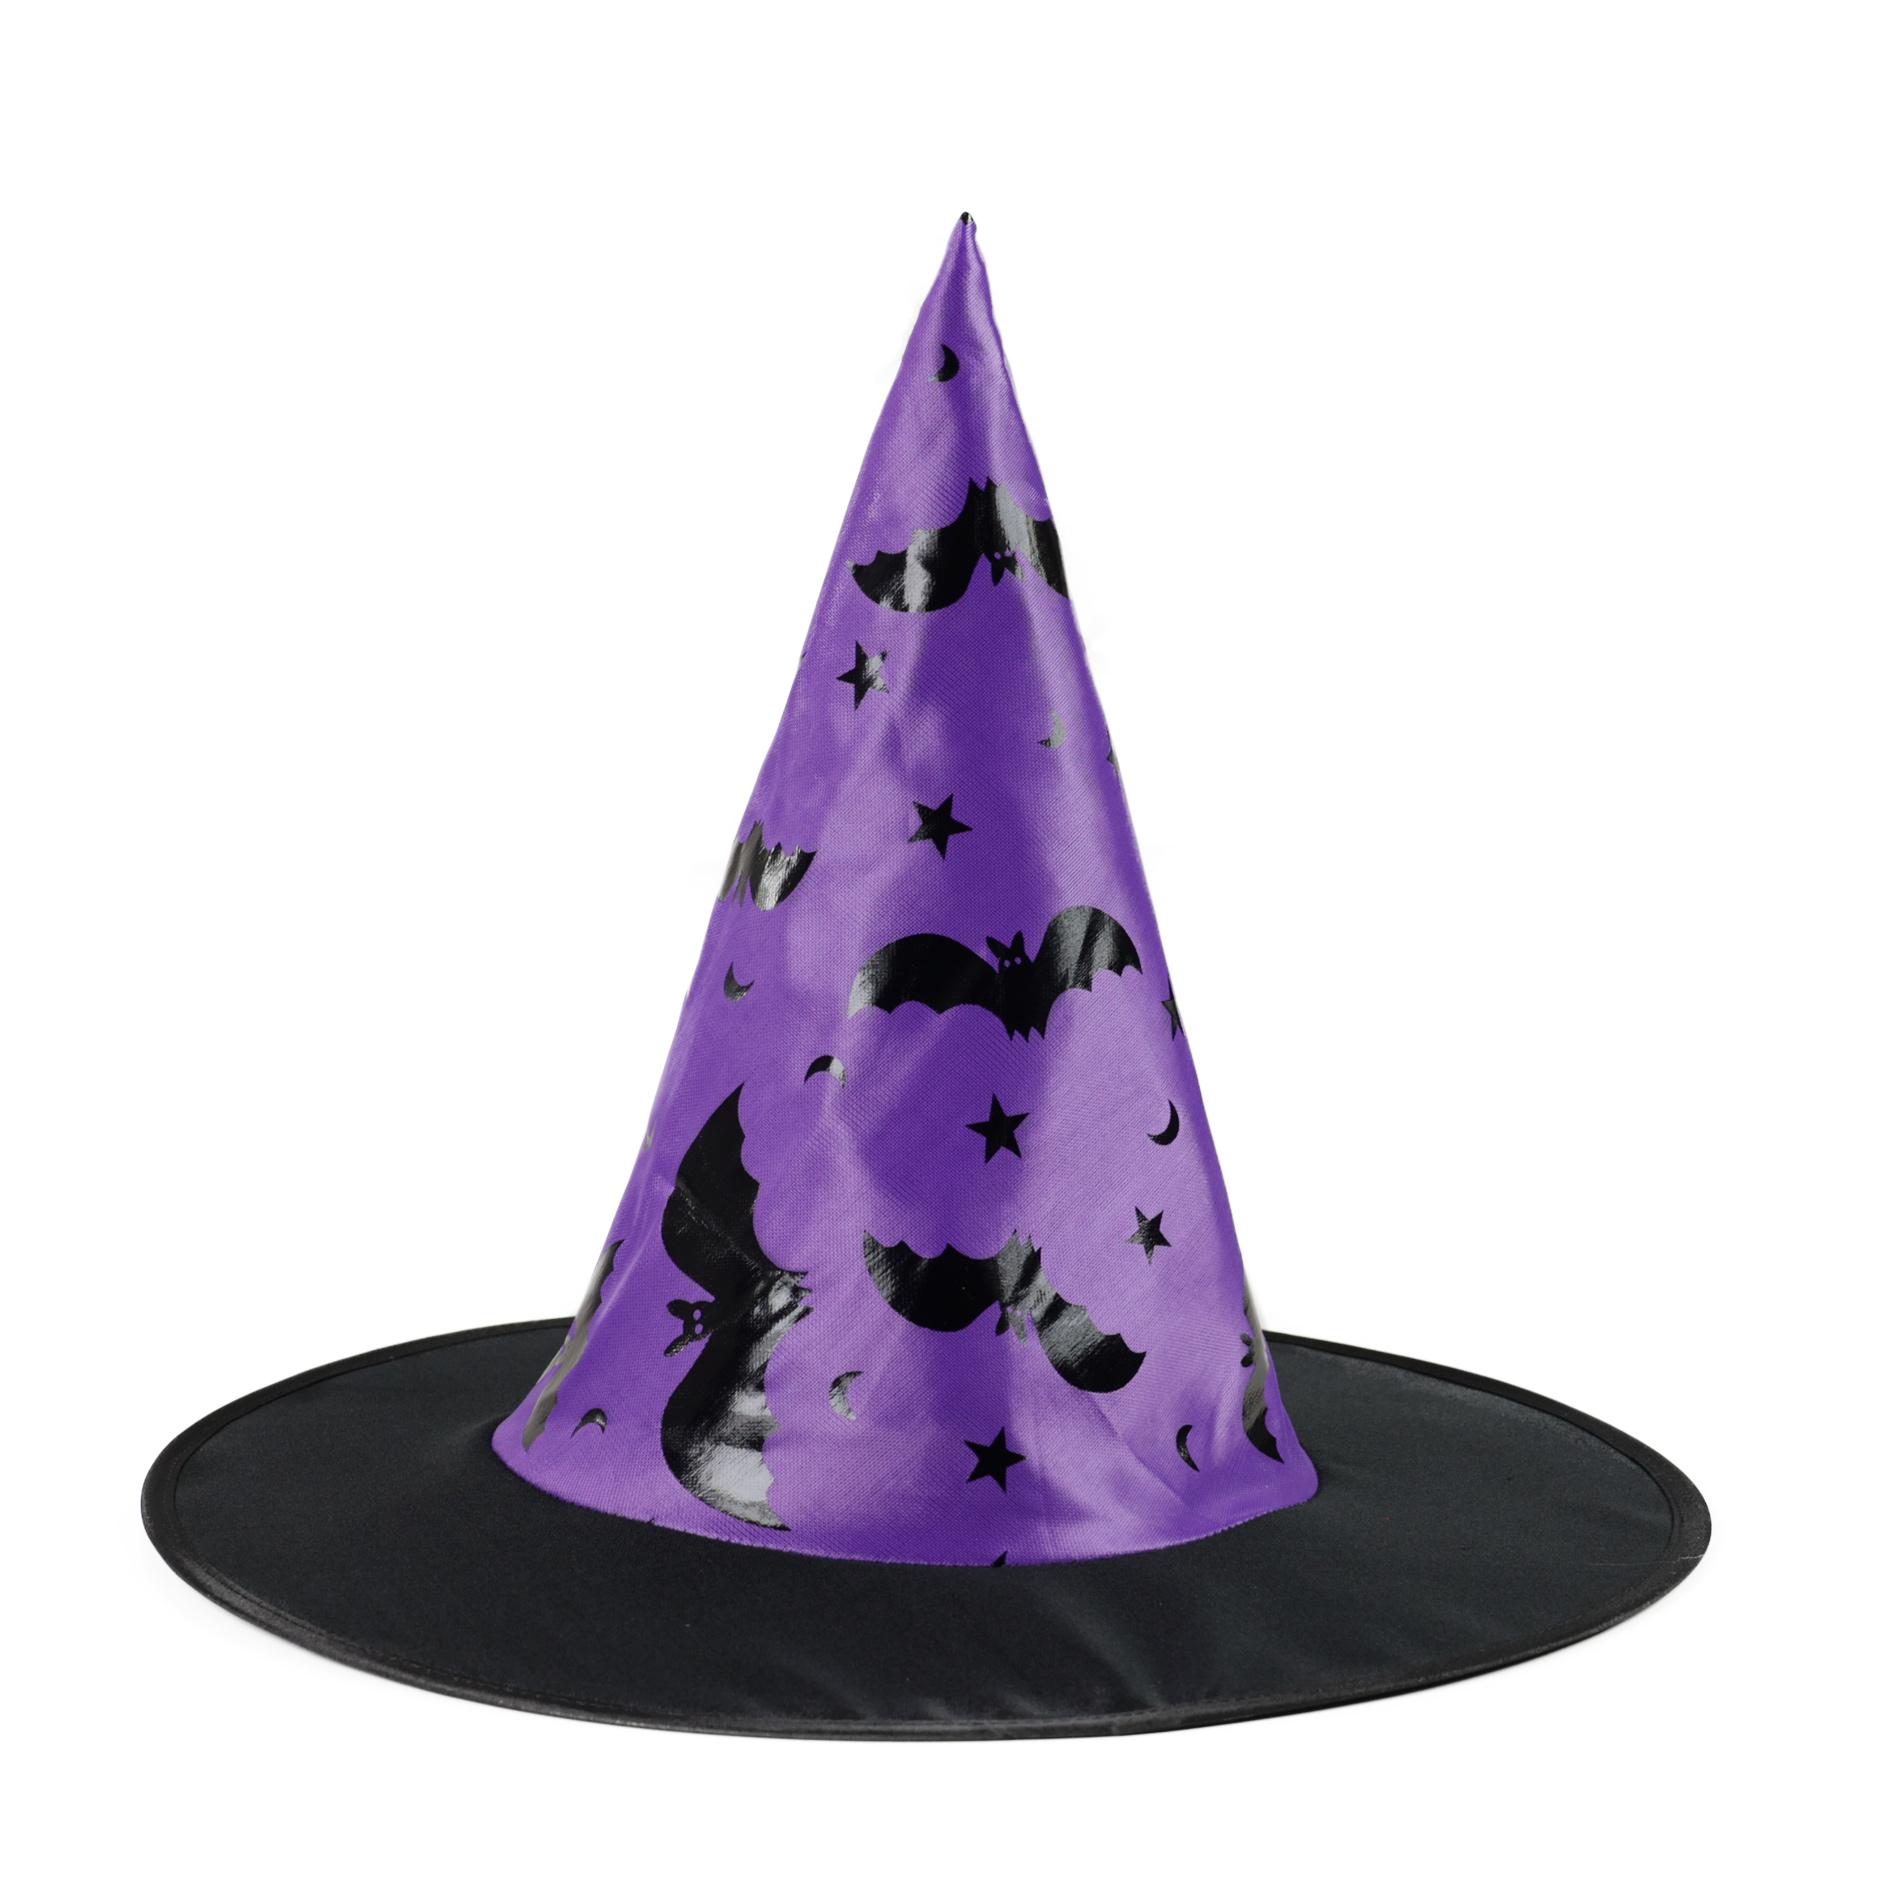 klobúk čarodejnícky netopier